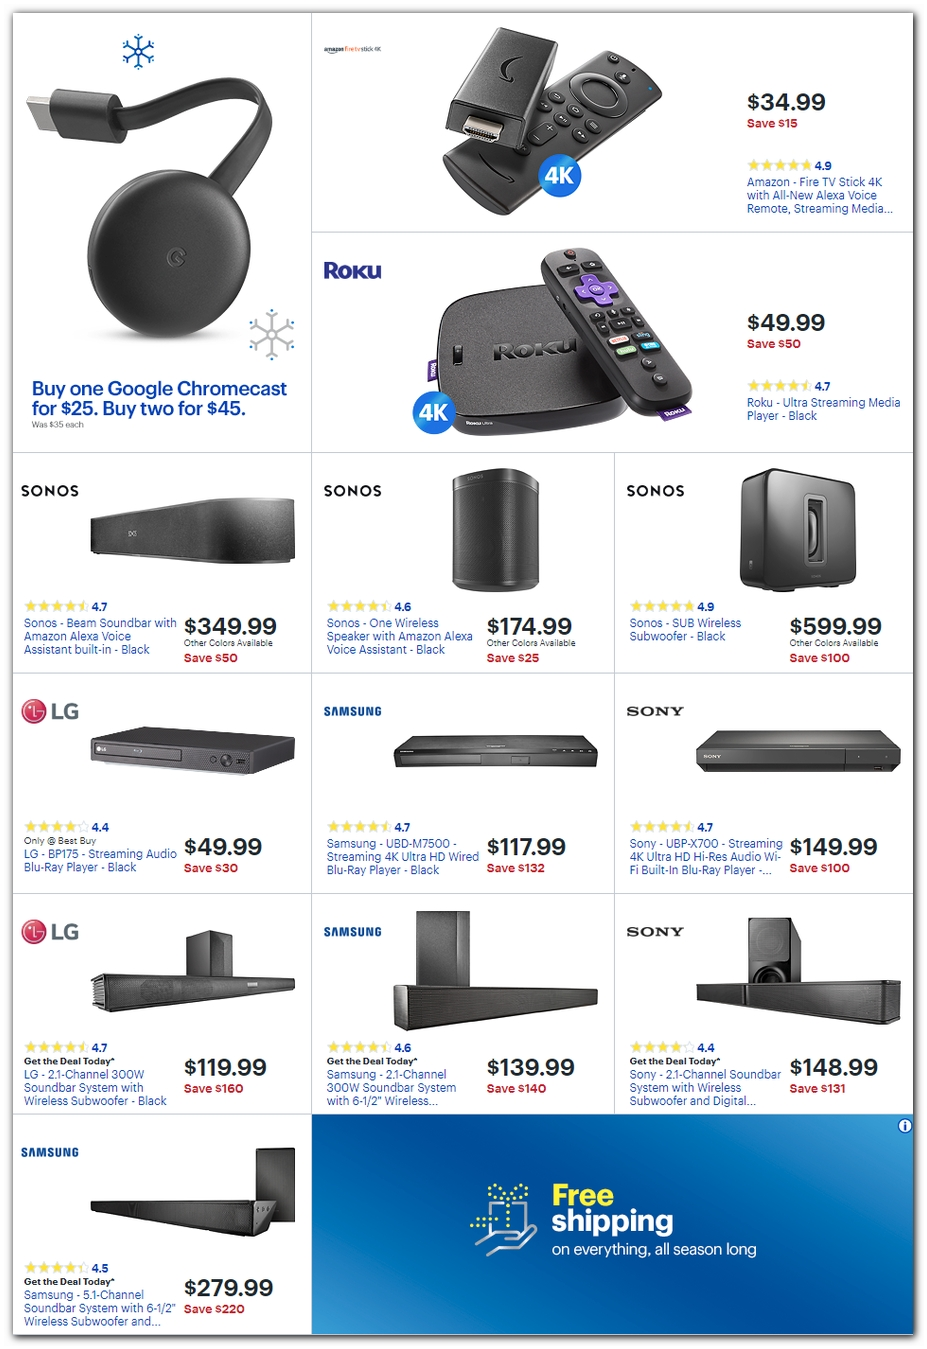 Best Buy Black Friday 2018 Ad